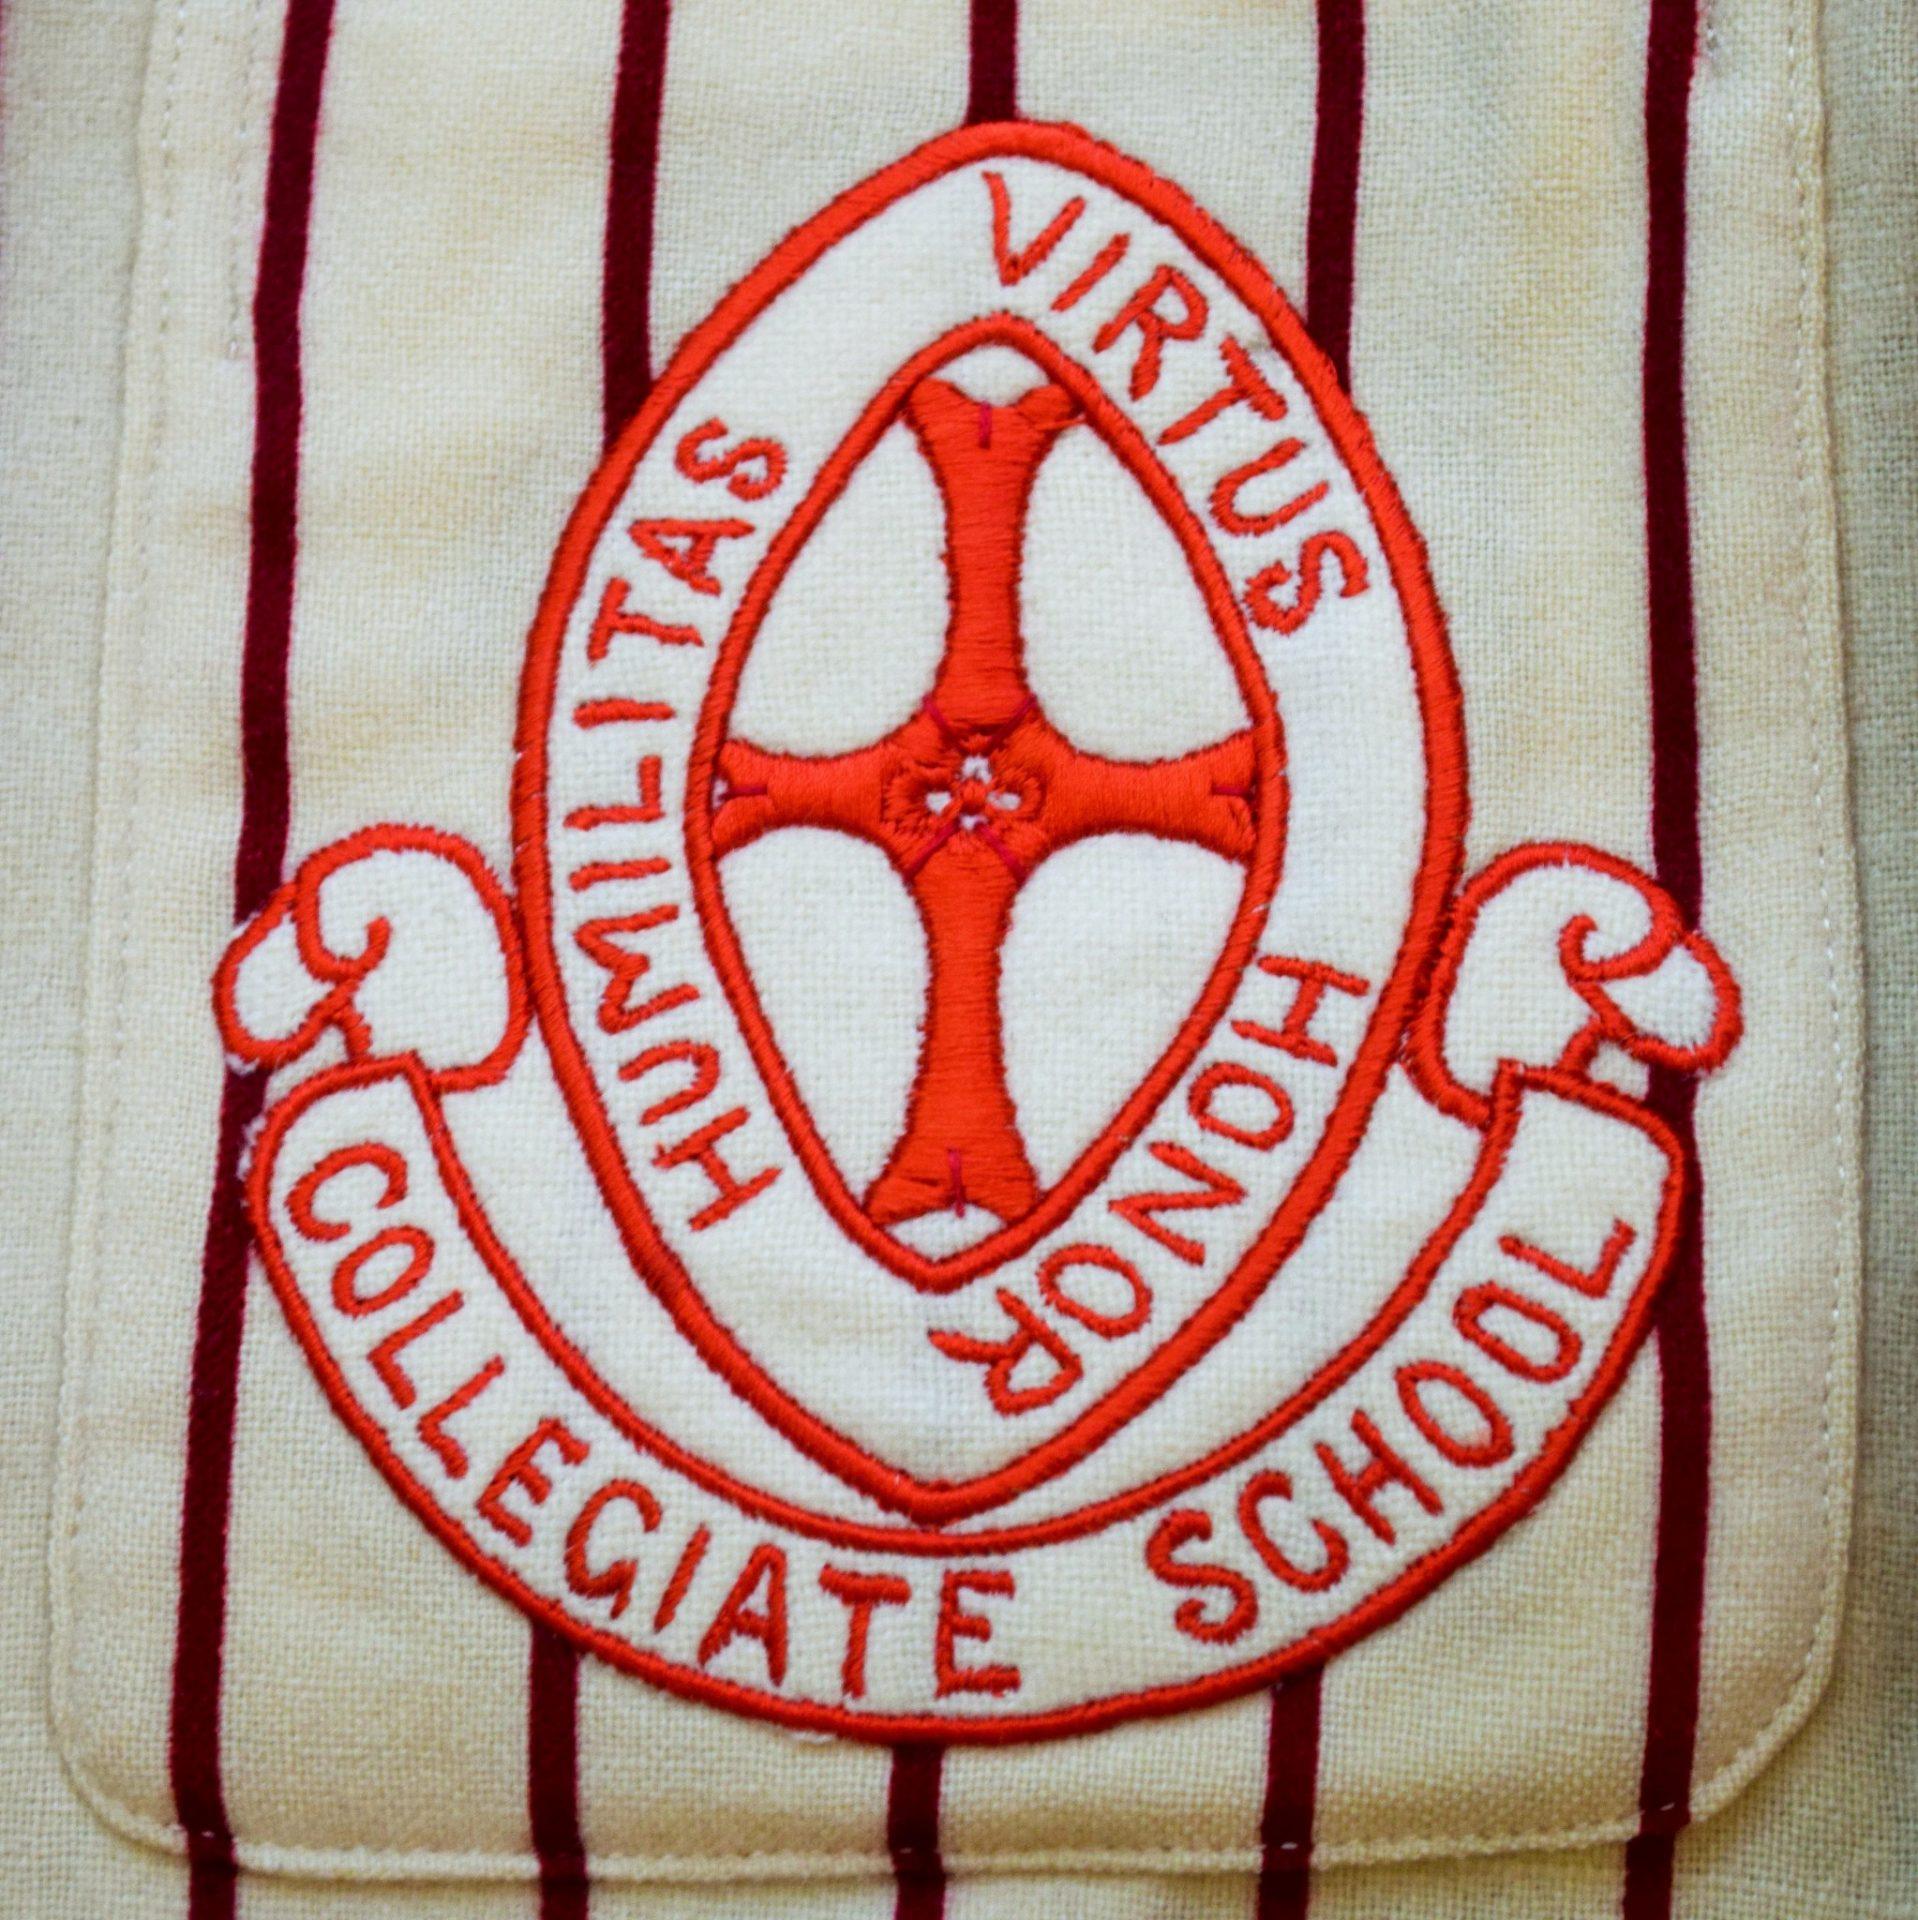 Collegiate Old Girls' Association